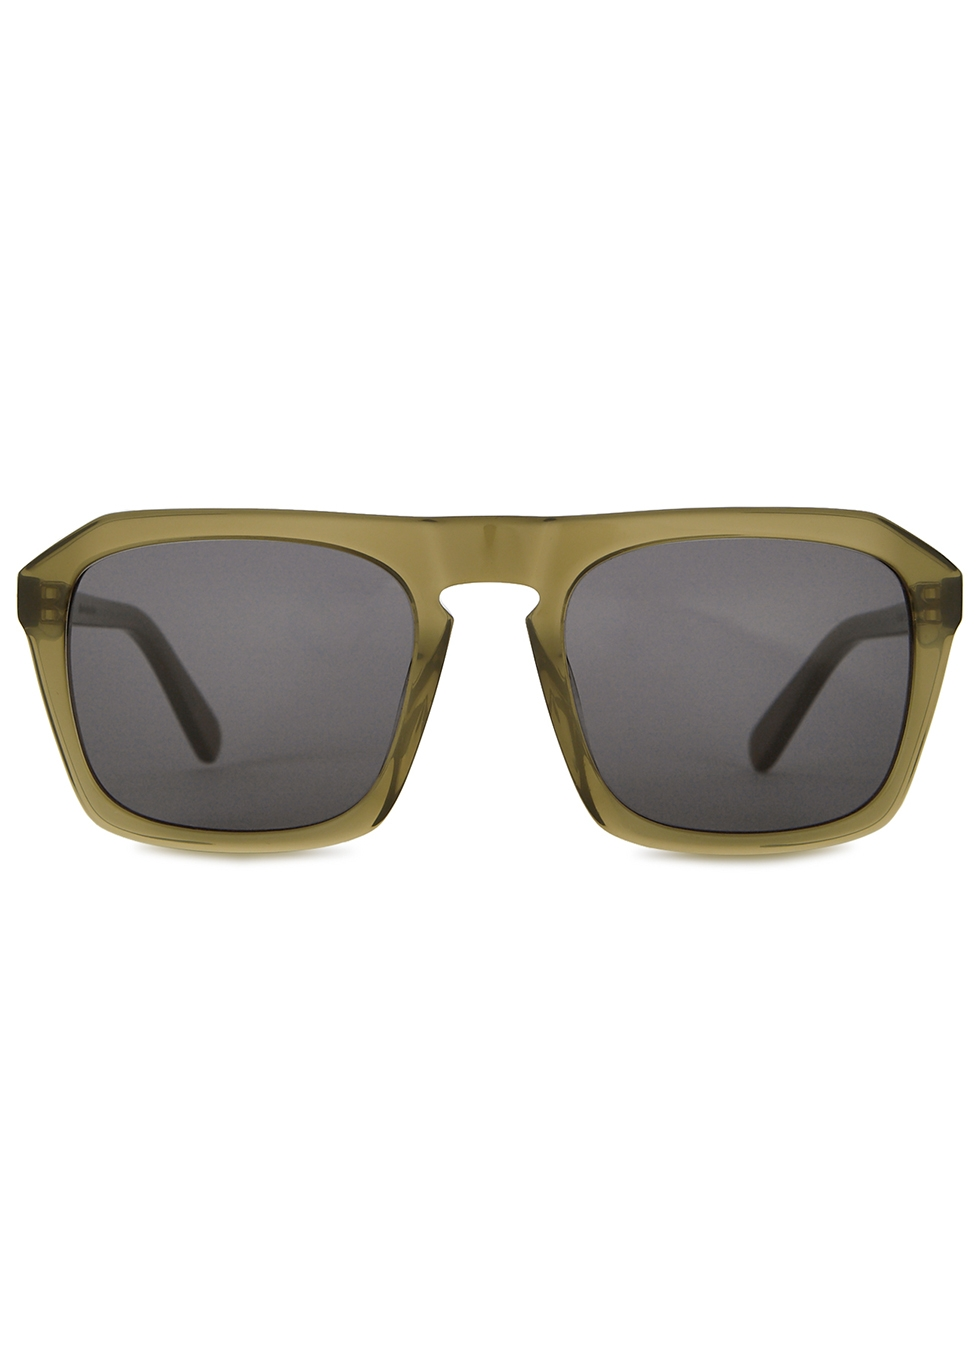 Murdoch army green D-frame sunglasses - Finlay & Co